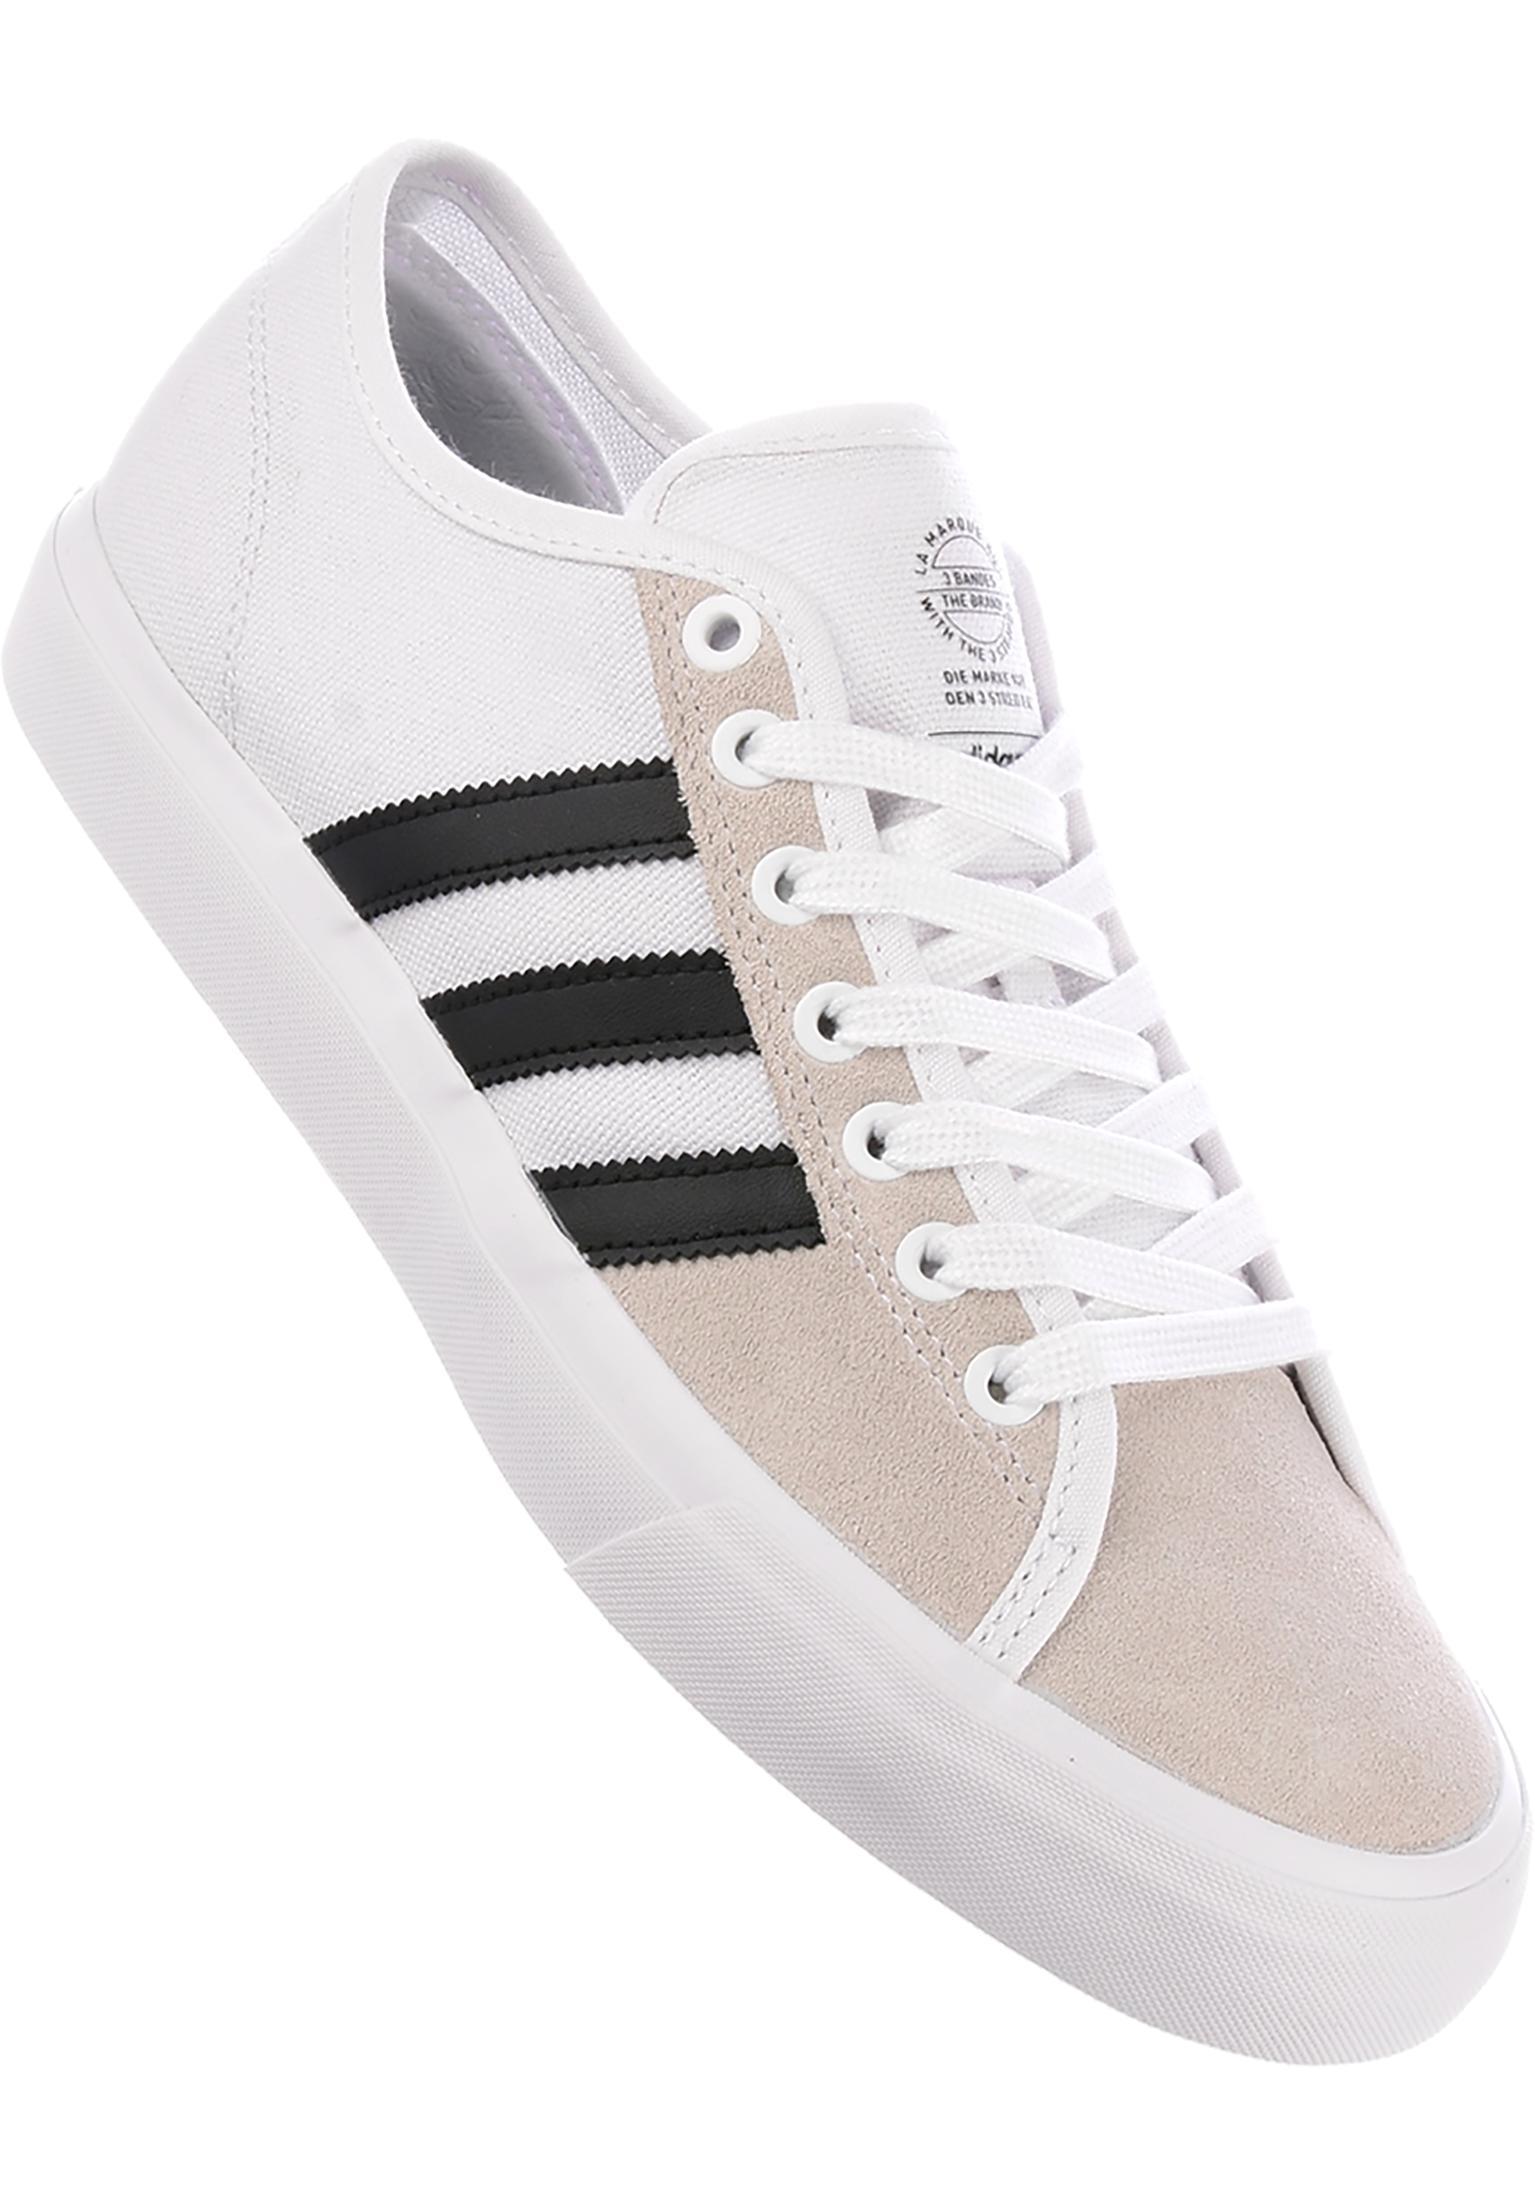 best loved 989e2 24655 Matchcourt RX adidas-skateboarding Tutte le scarpe in white-black-white da  Uomo   Titus